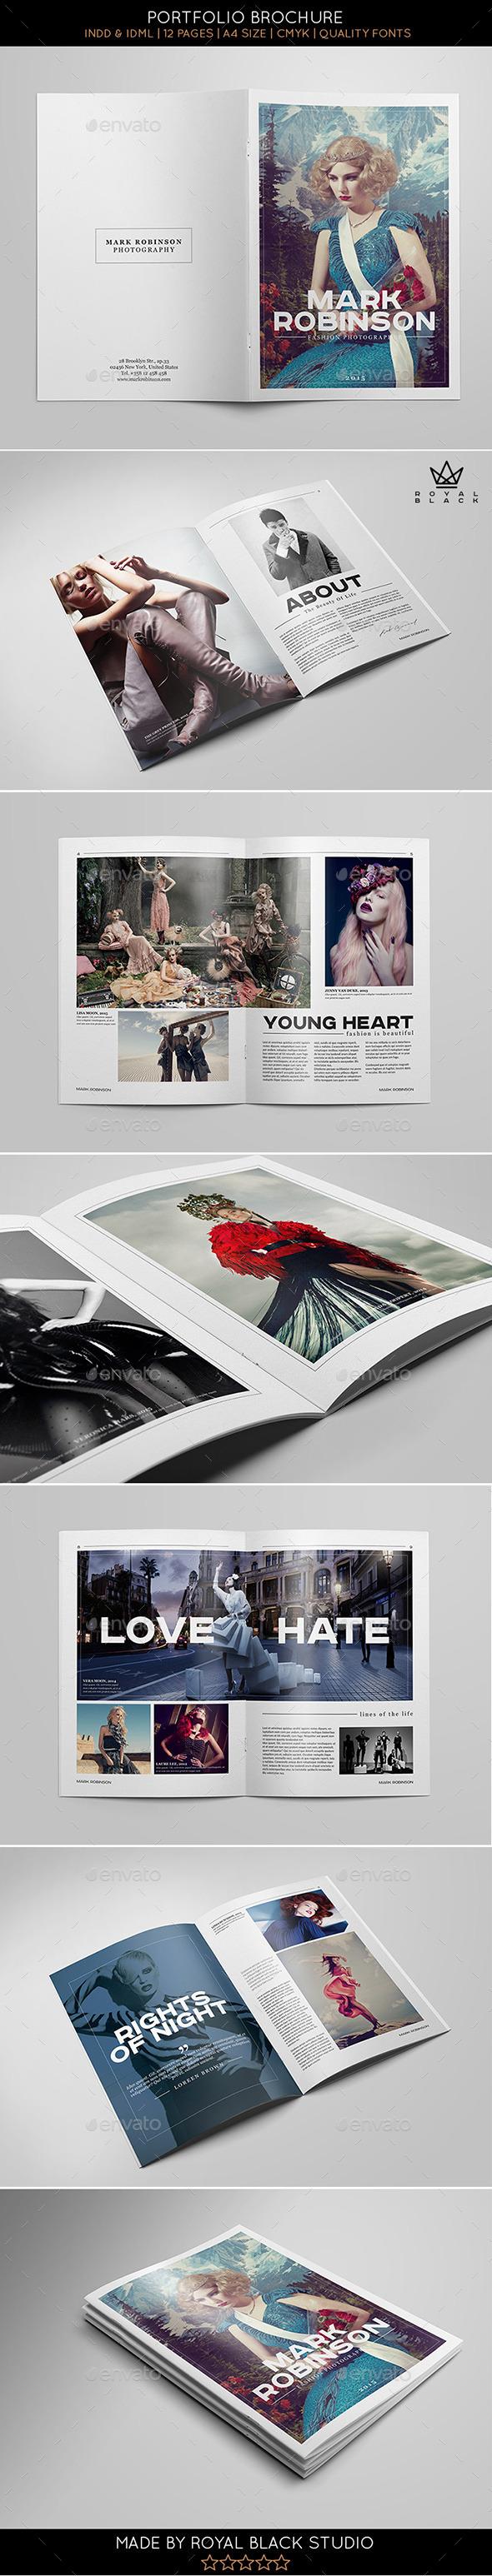 GraphicRiver Portfolio Brochure Vol.6 10417784